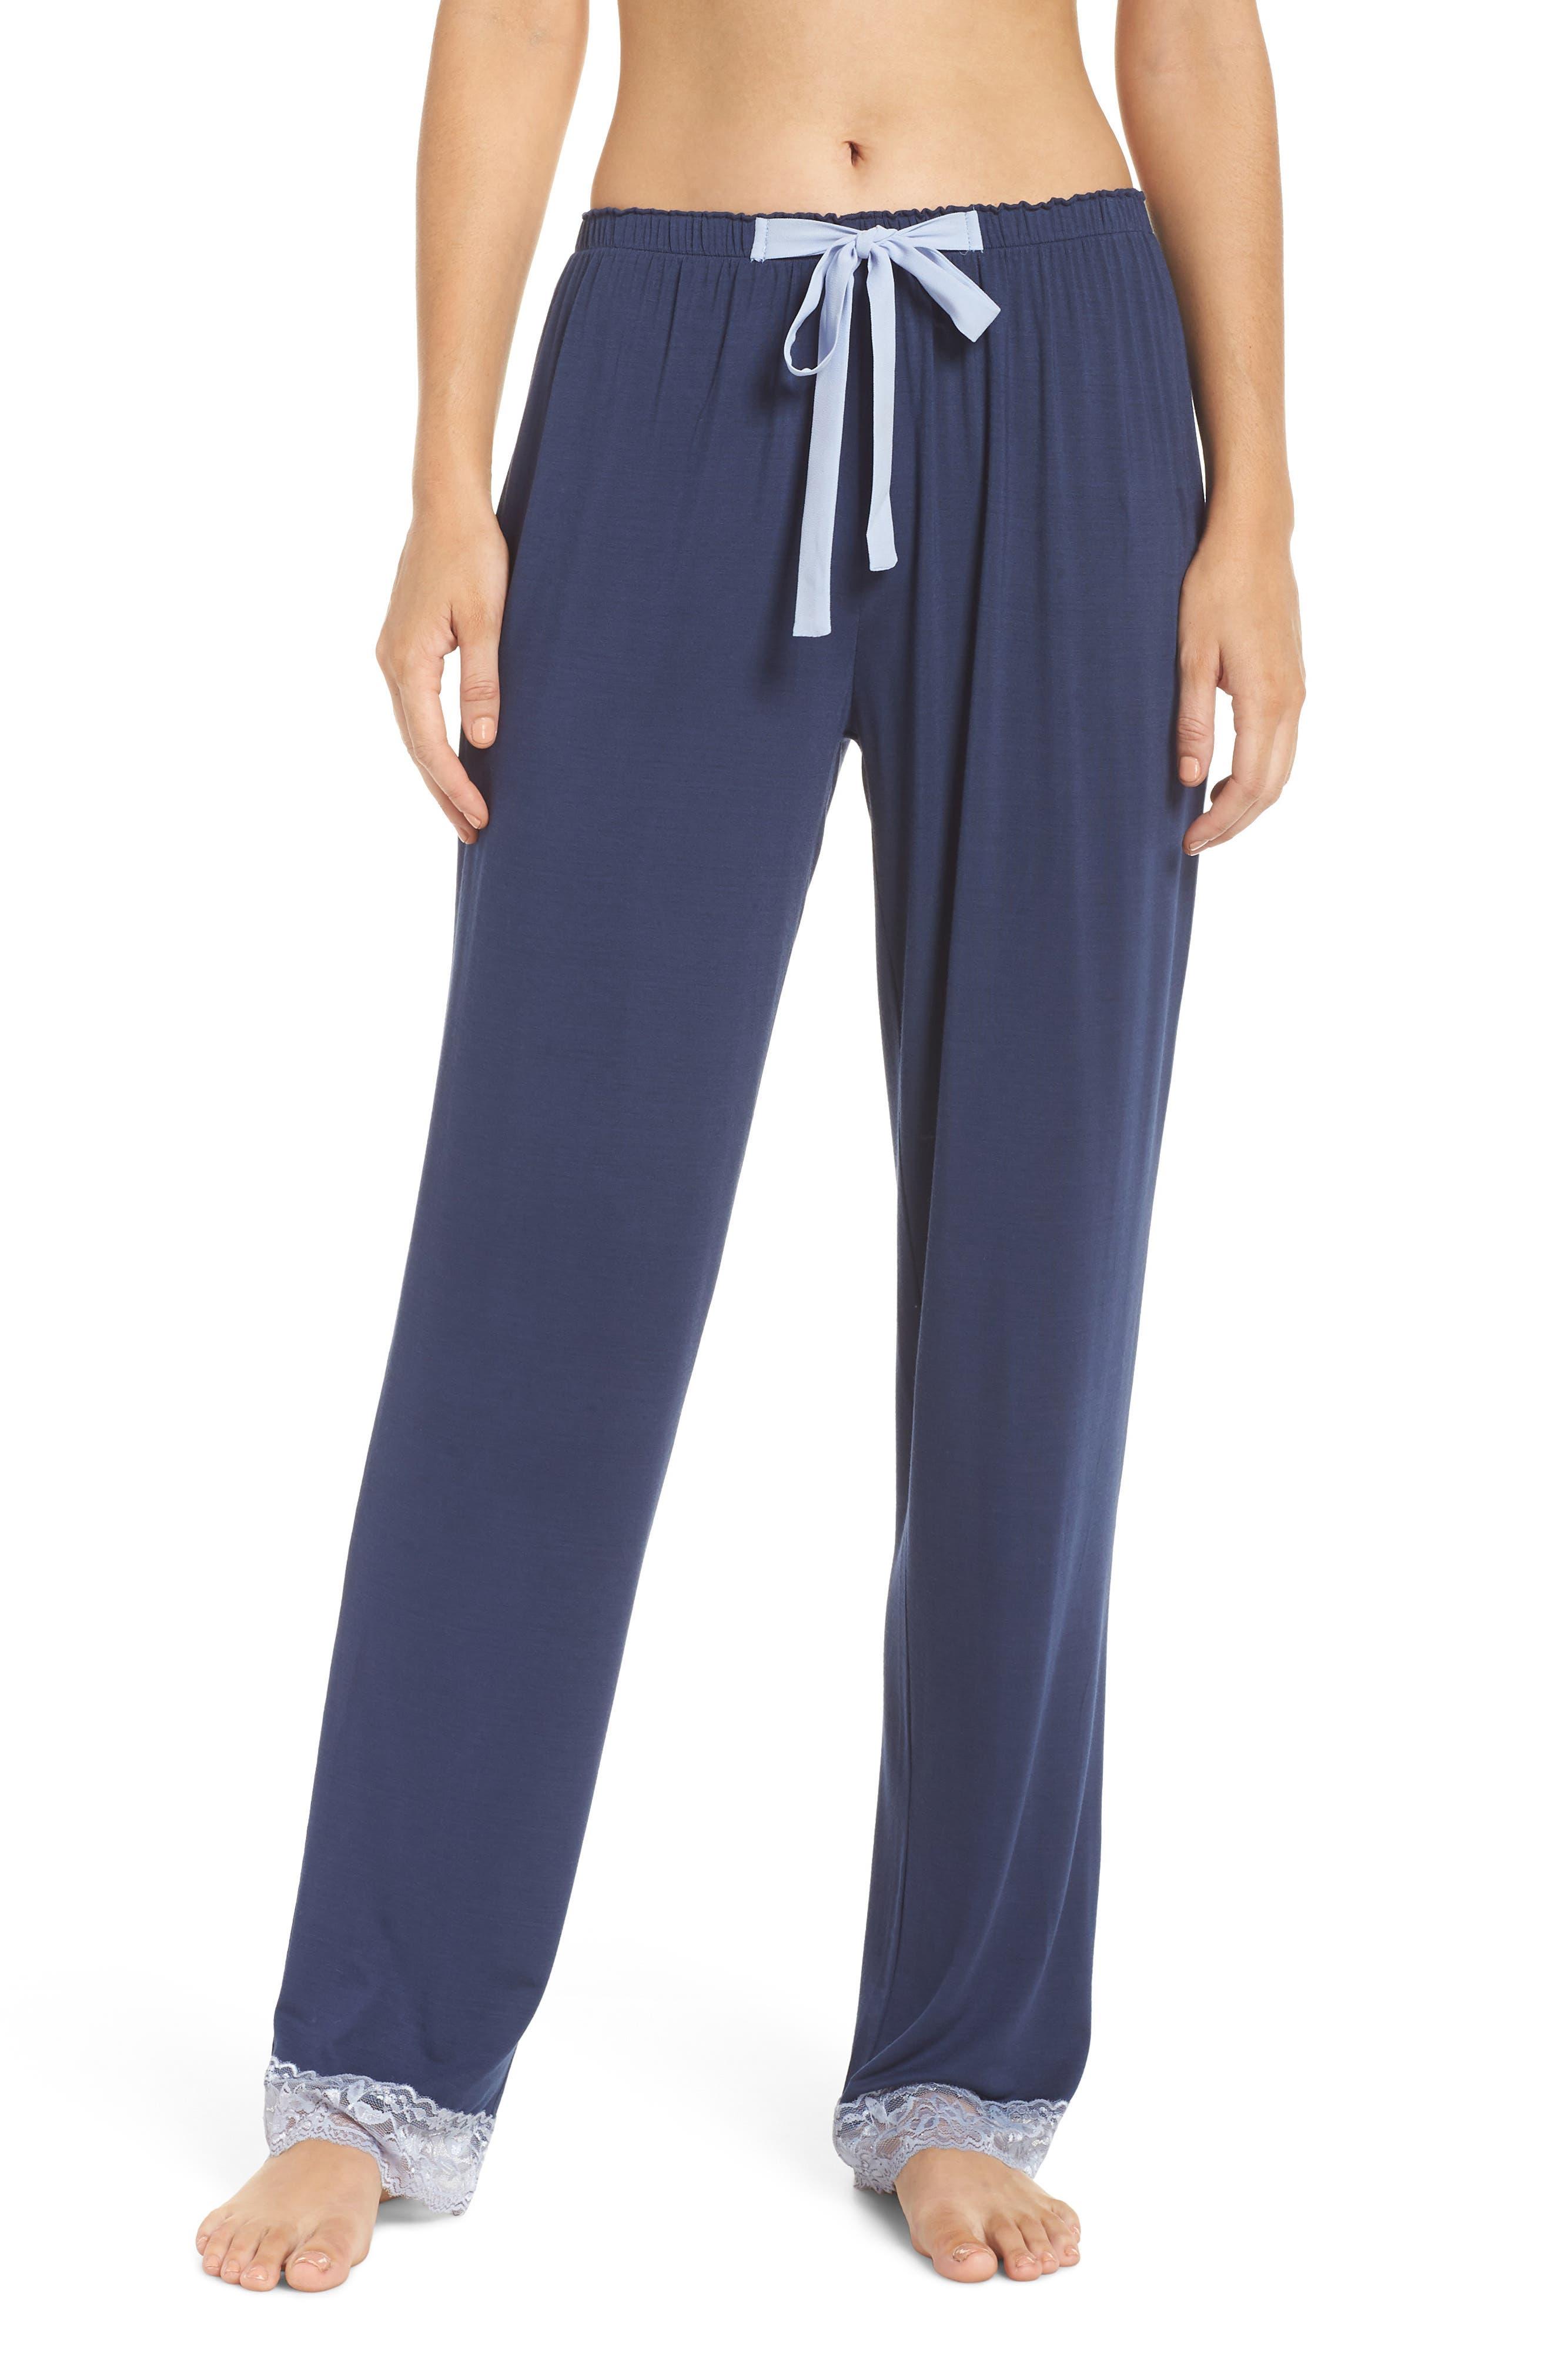 Snuggle Lounge Pants,                         Main,                         color, STEEL BLUE